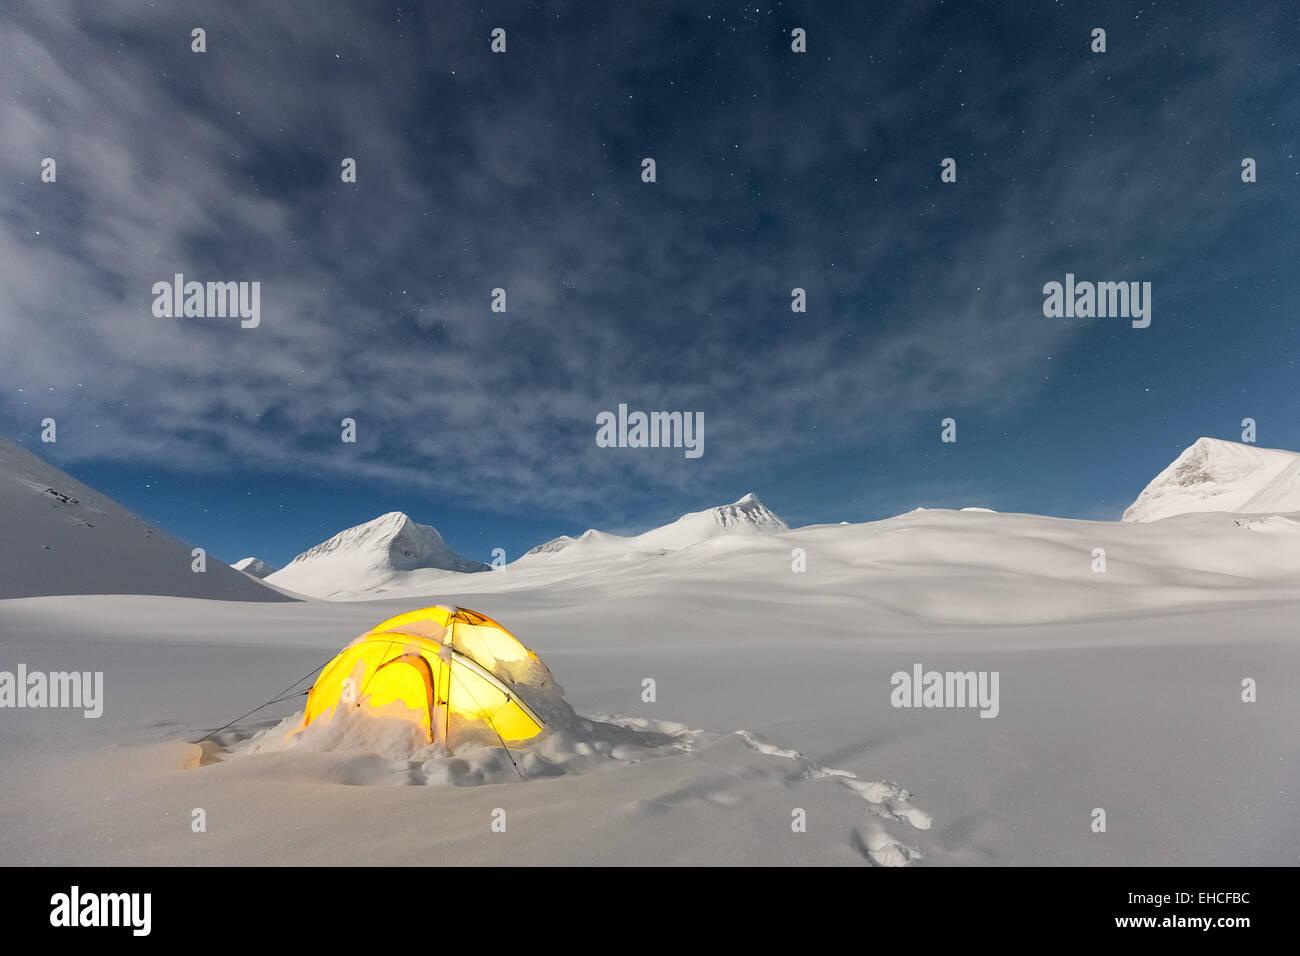 Campamento de Invierno junto al desierto Nallostugan hut, zona de montaña Kebnekaise, Kiruna, Suecia, Europa, Imagen De Stock